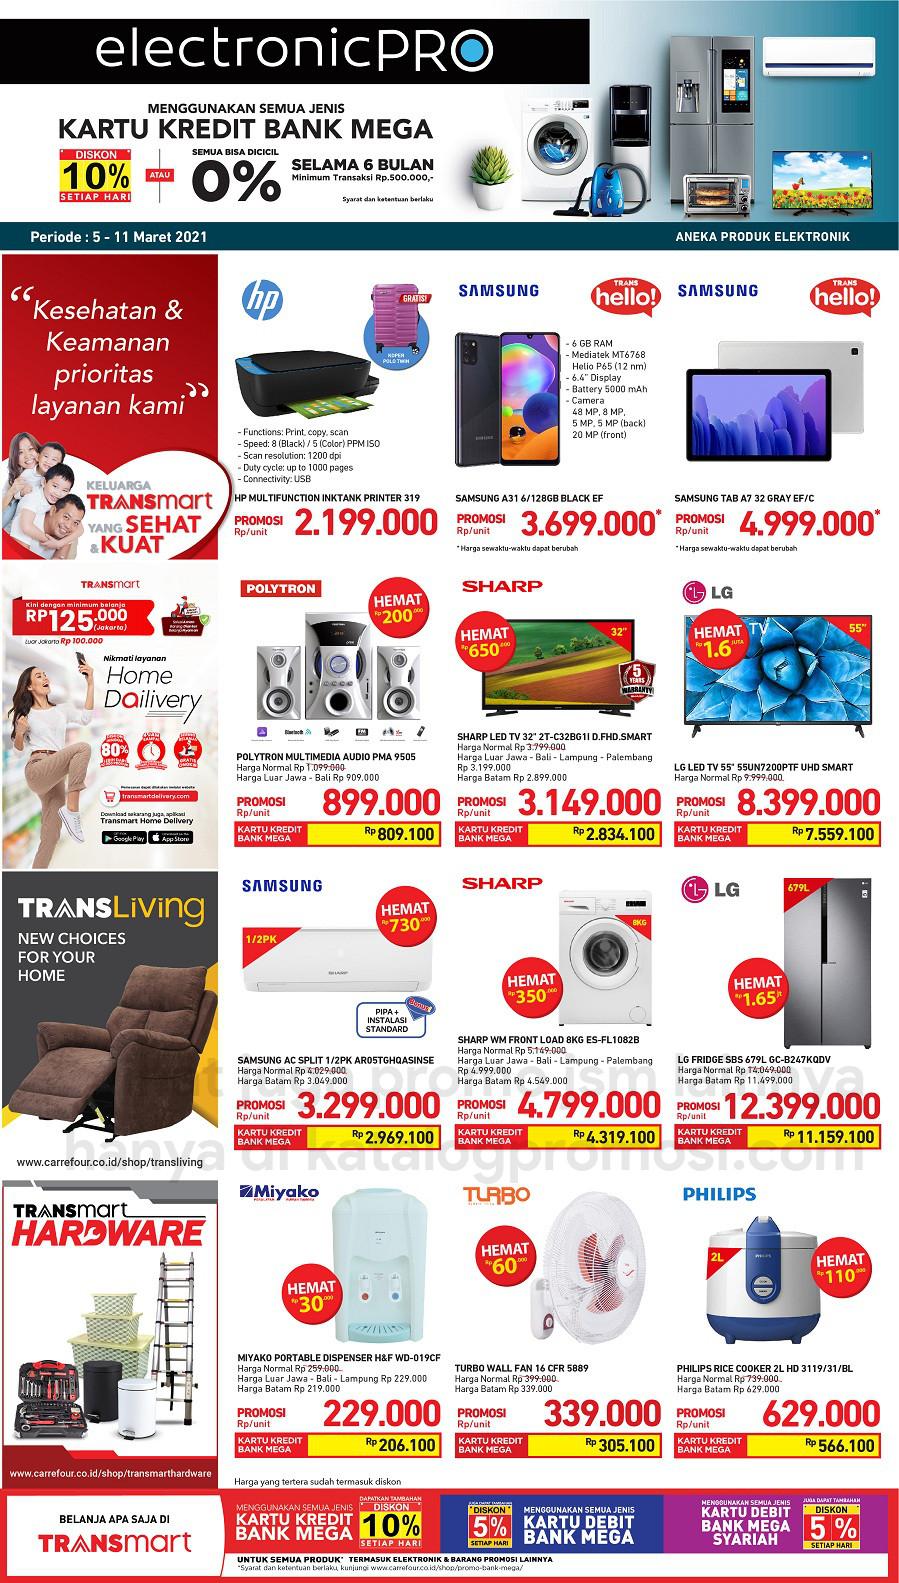 Promo TRANSMART CARREFOUR Katalog Weekend JSM periode 05-09 Maret 2021